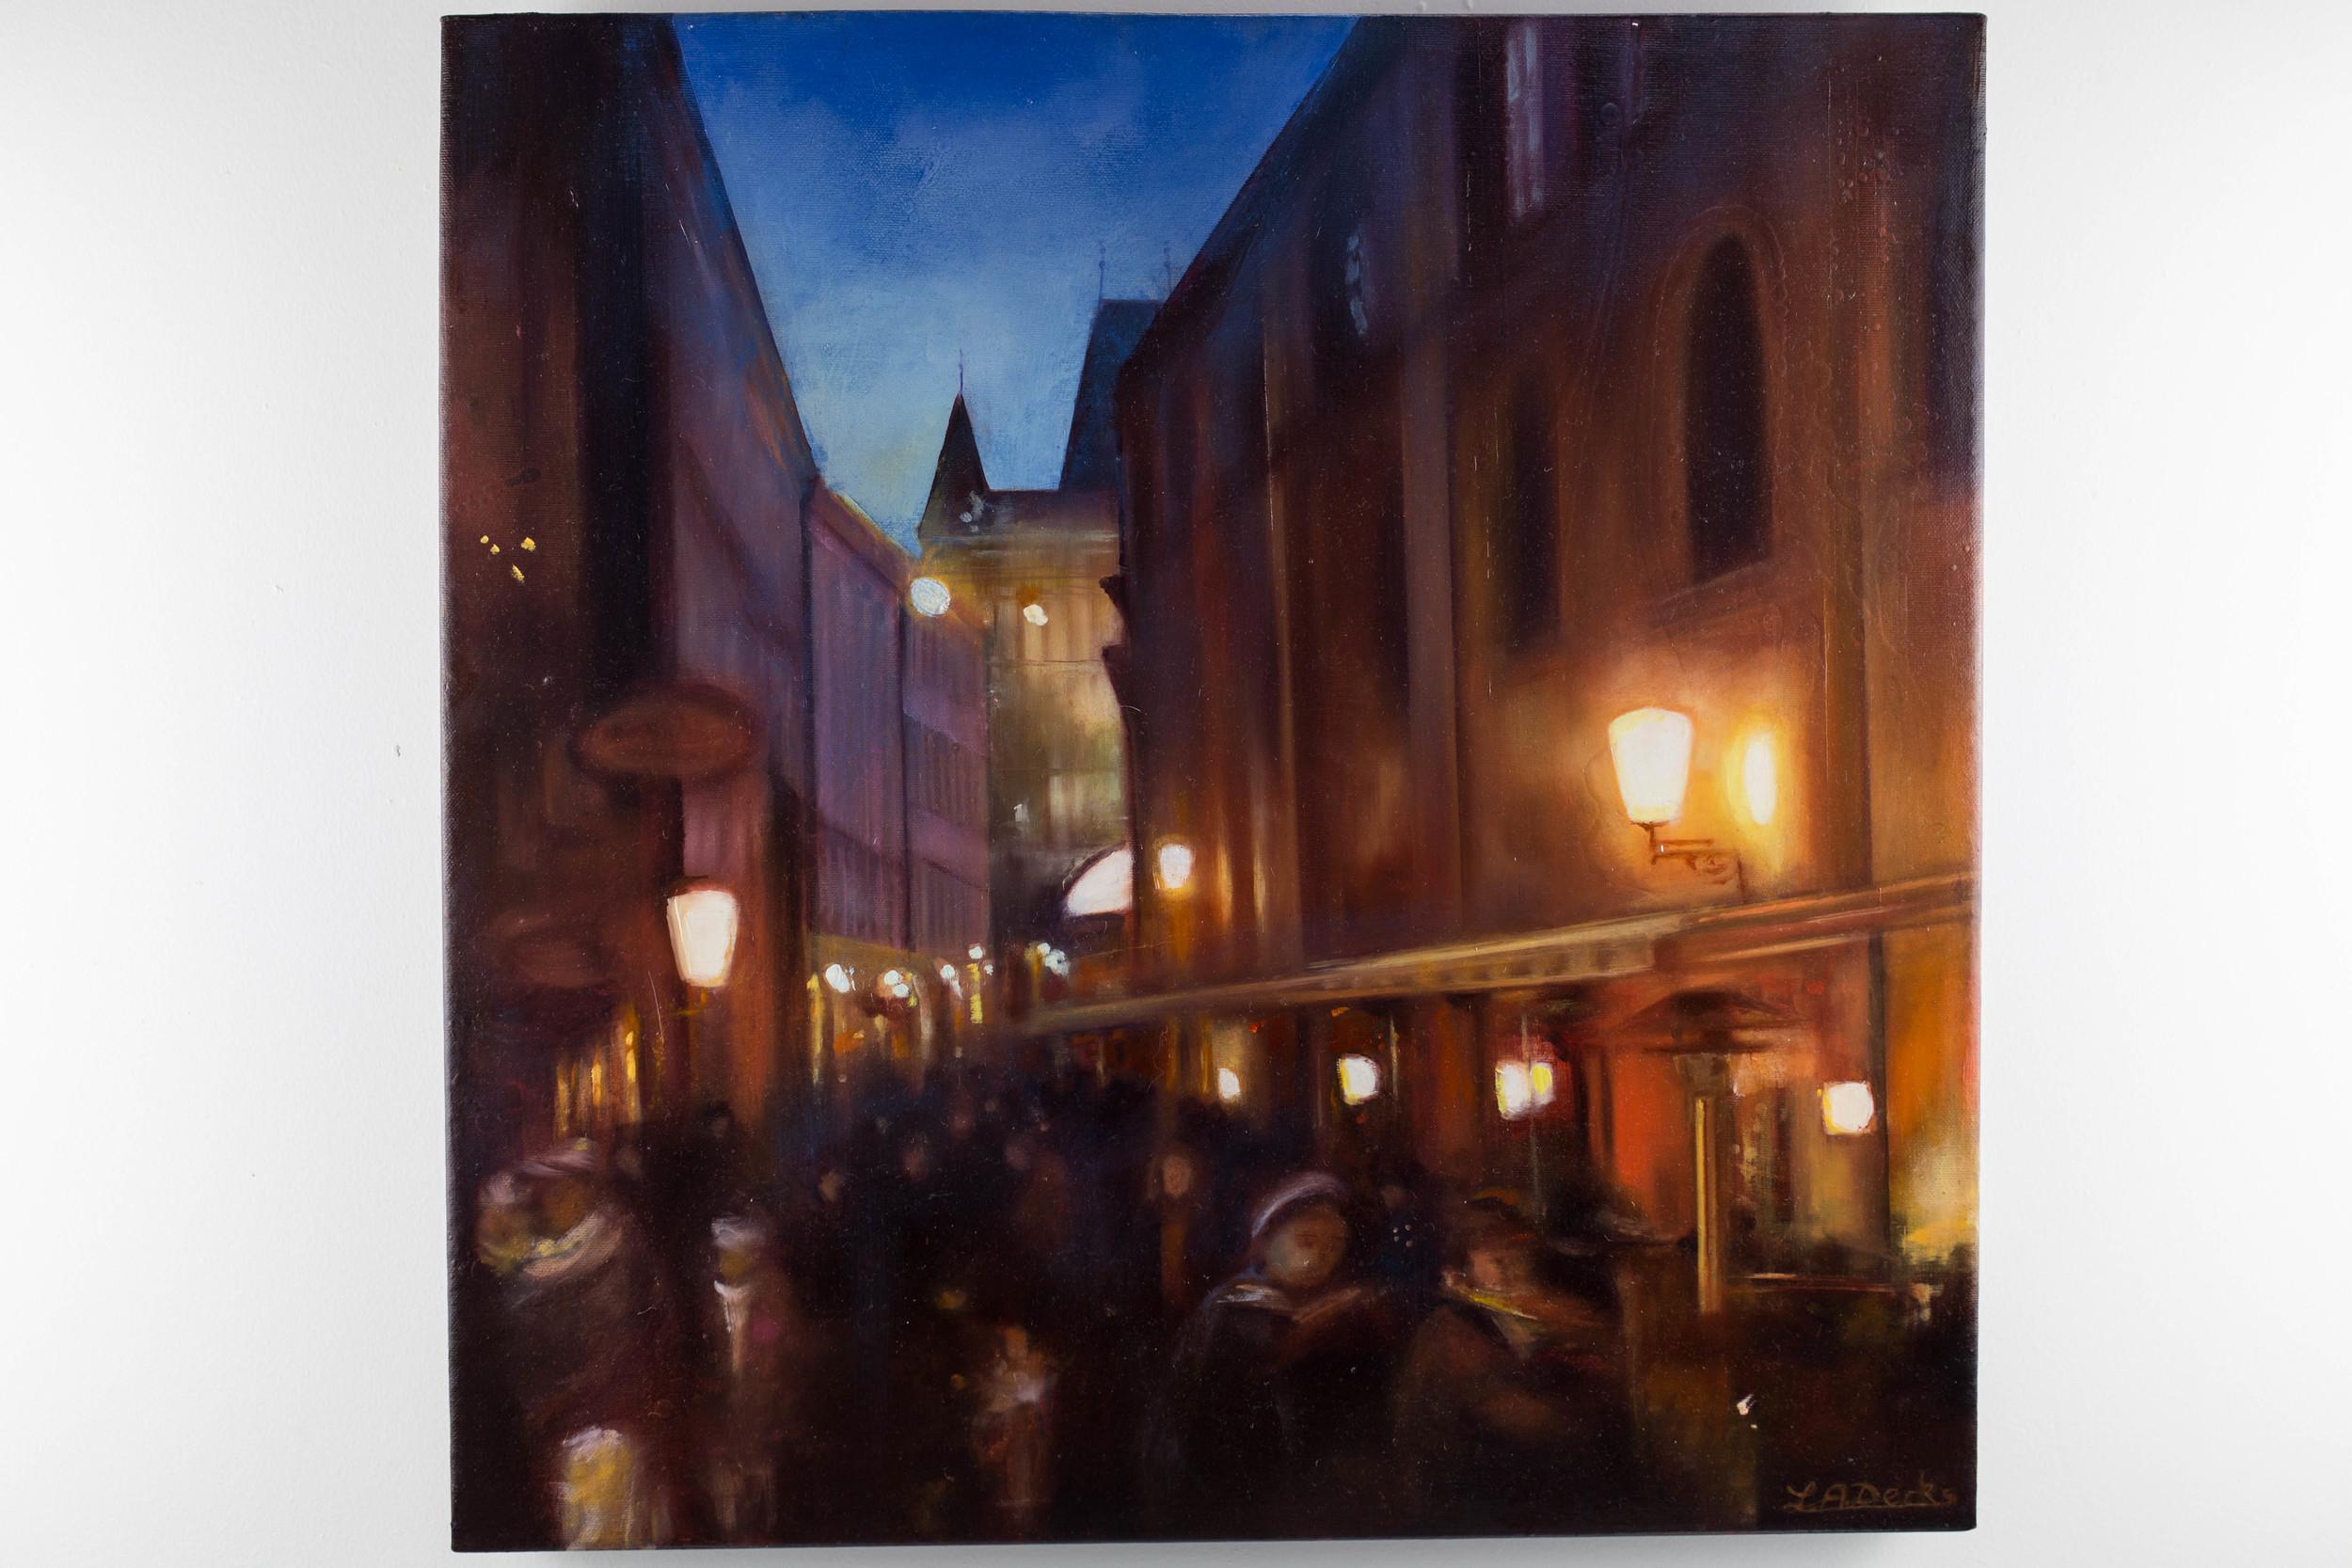 LOT 29   Lesley Anne Derks   Toward the Charles Bridge  Oil on Canvas